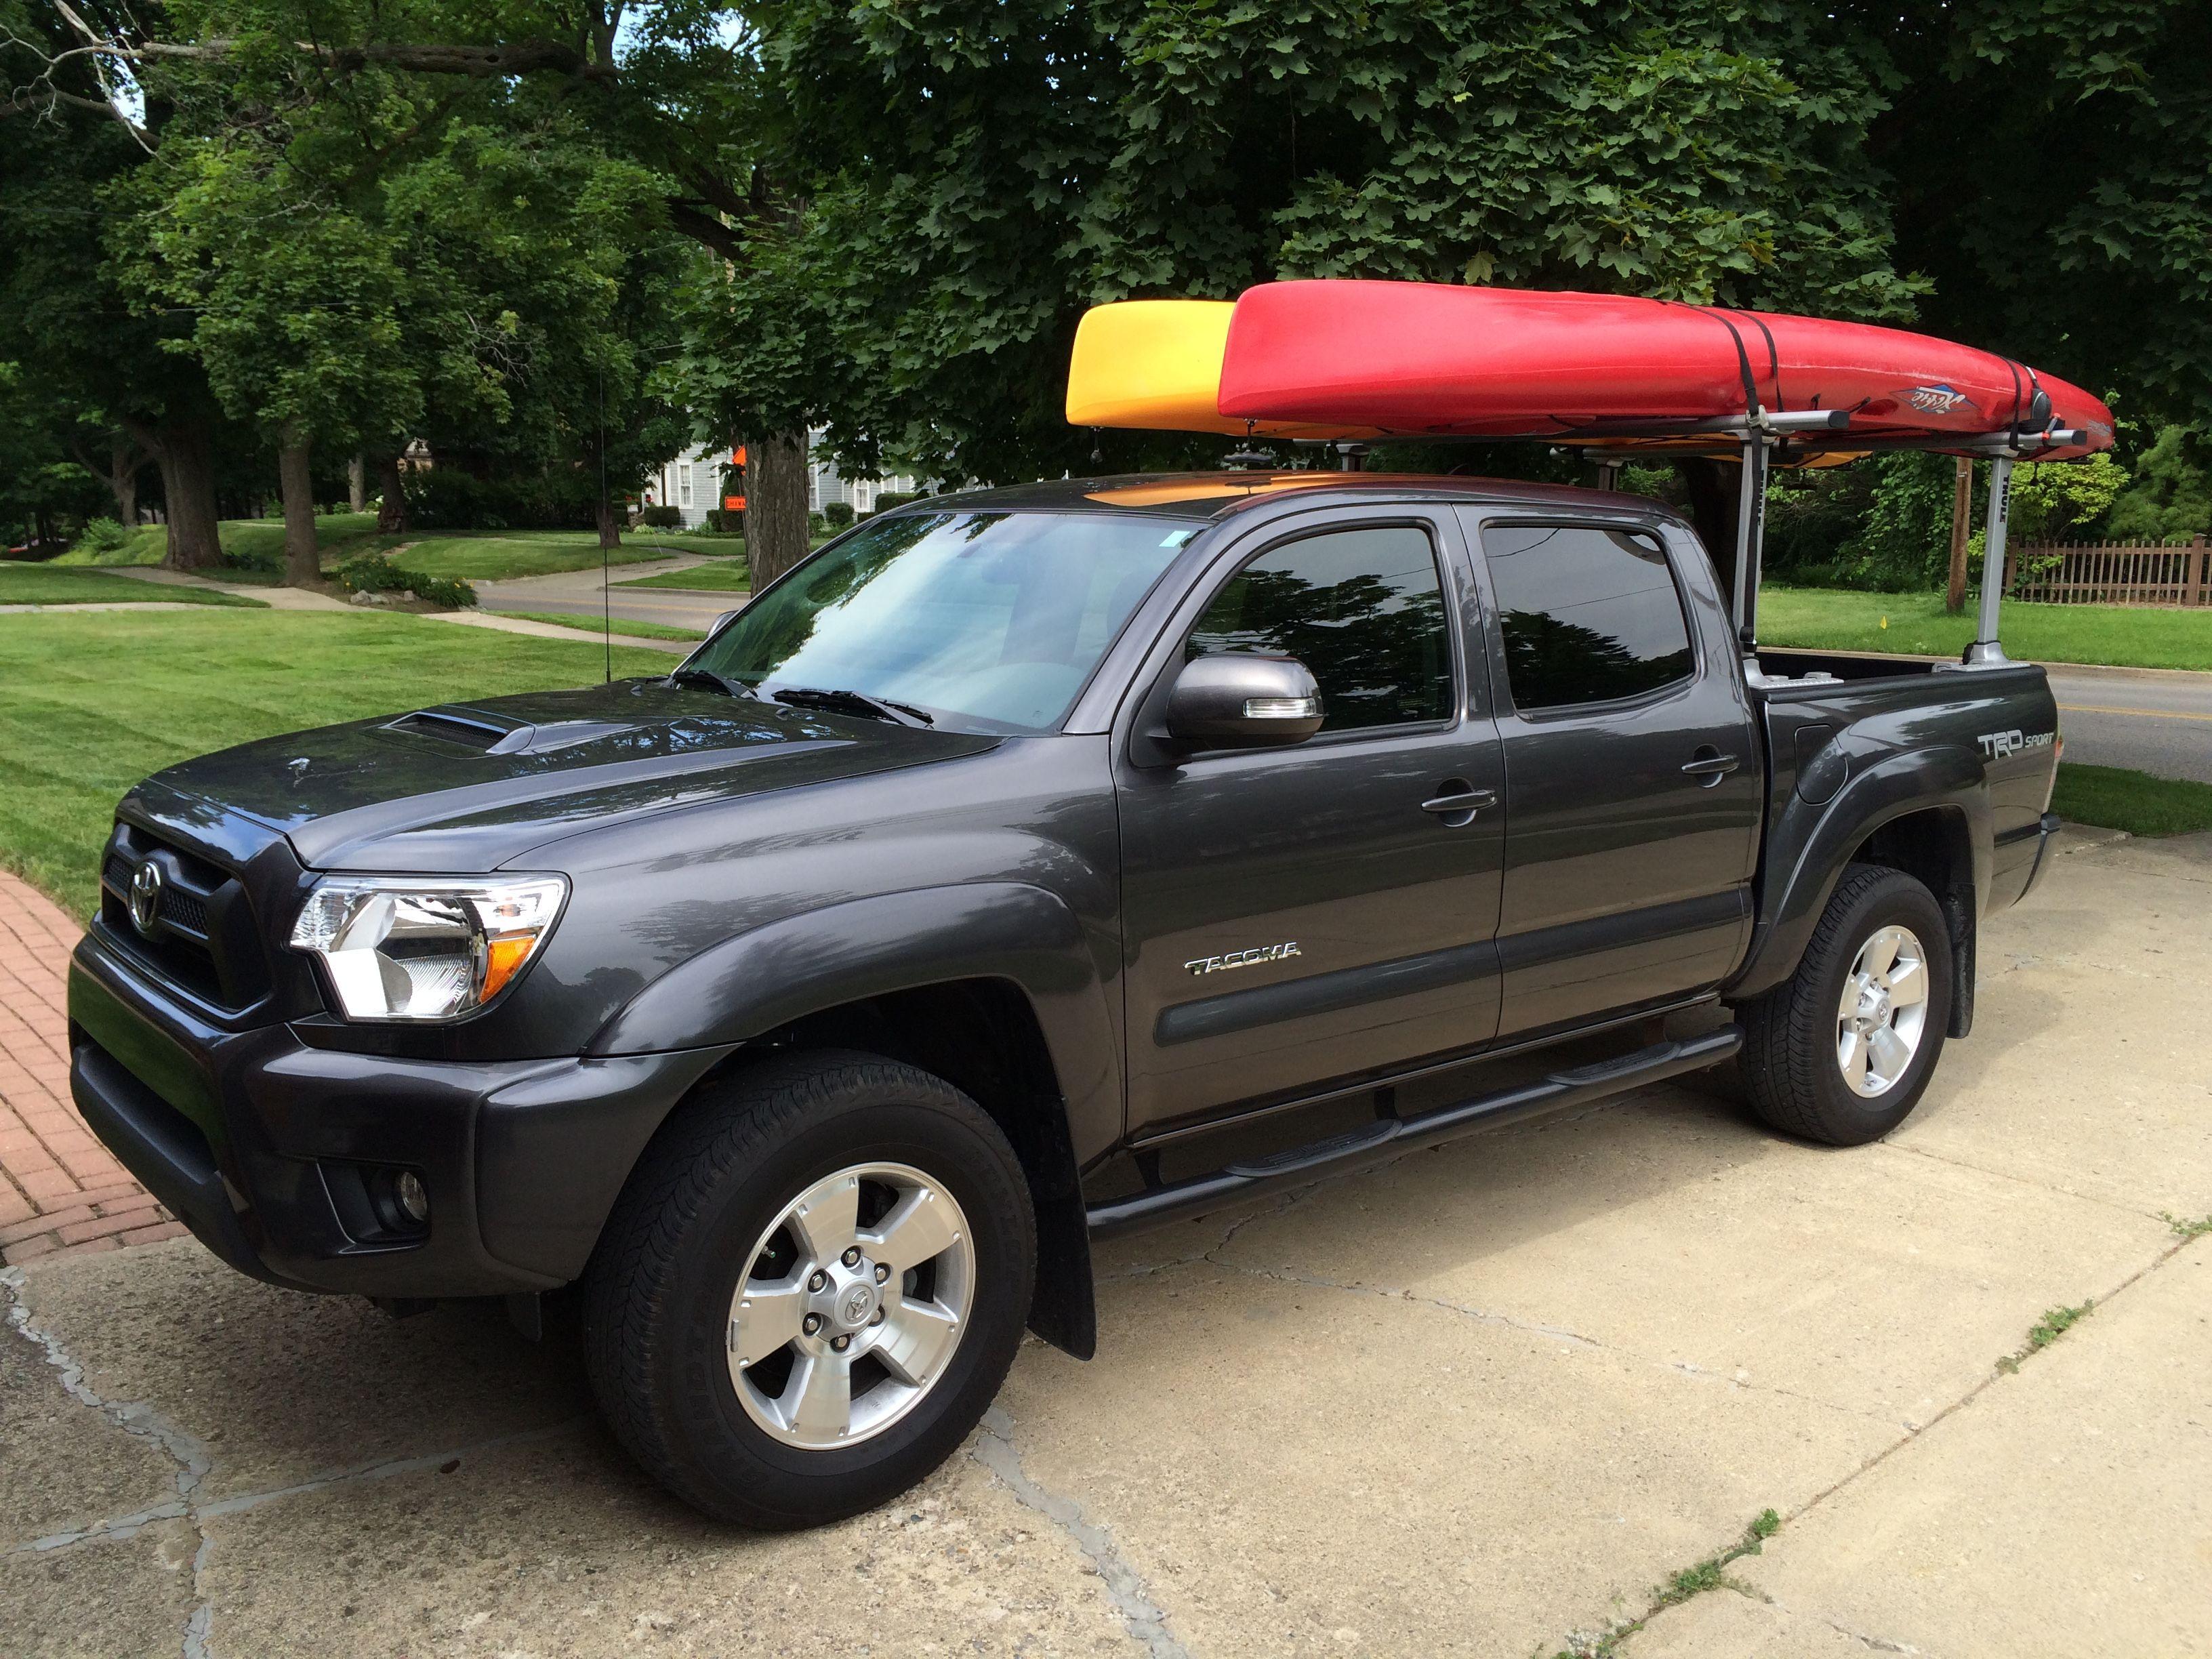 Hobie kayak, Thule rack | Truck | Pinterest | Thule rack ...